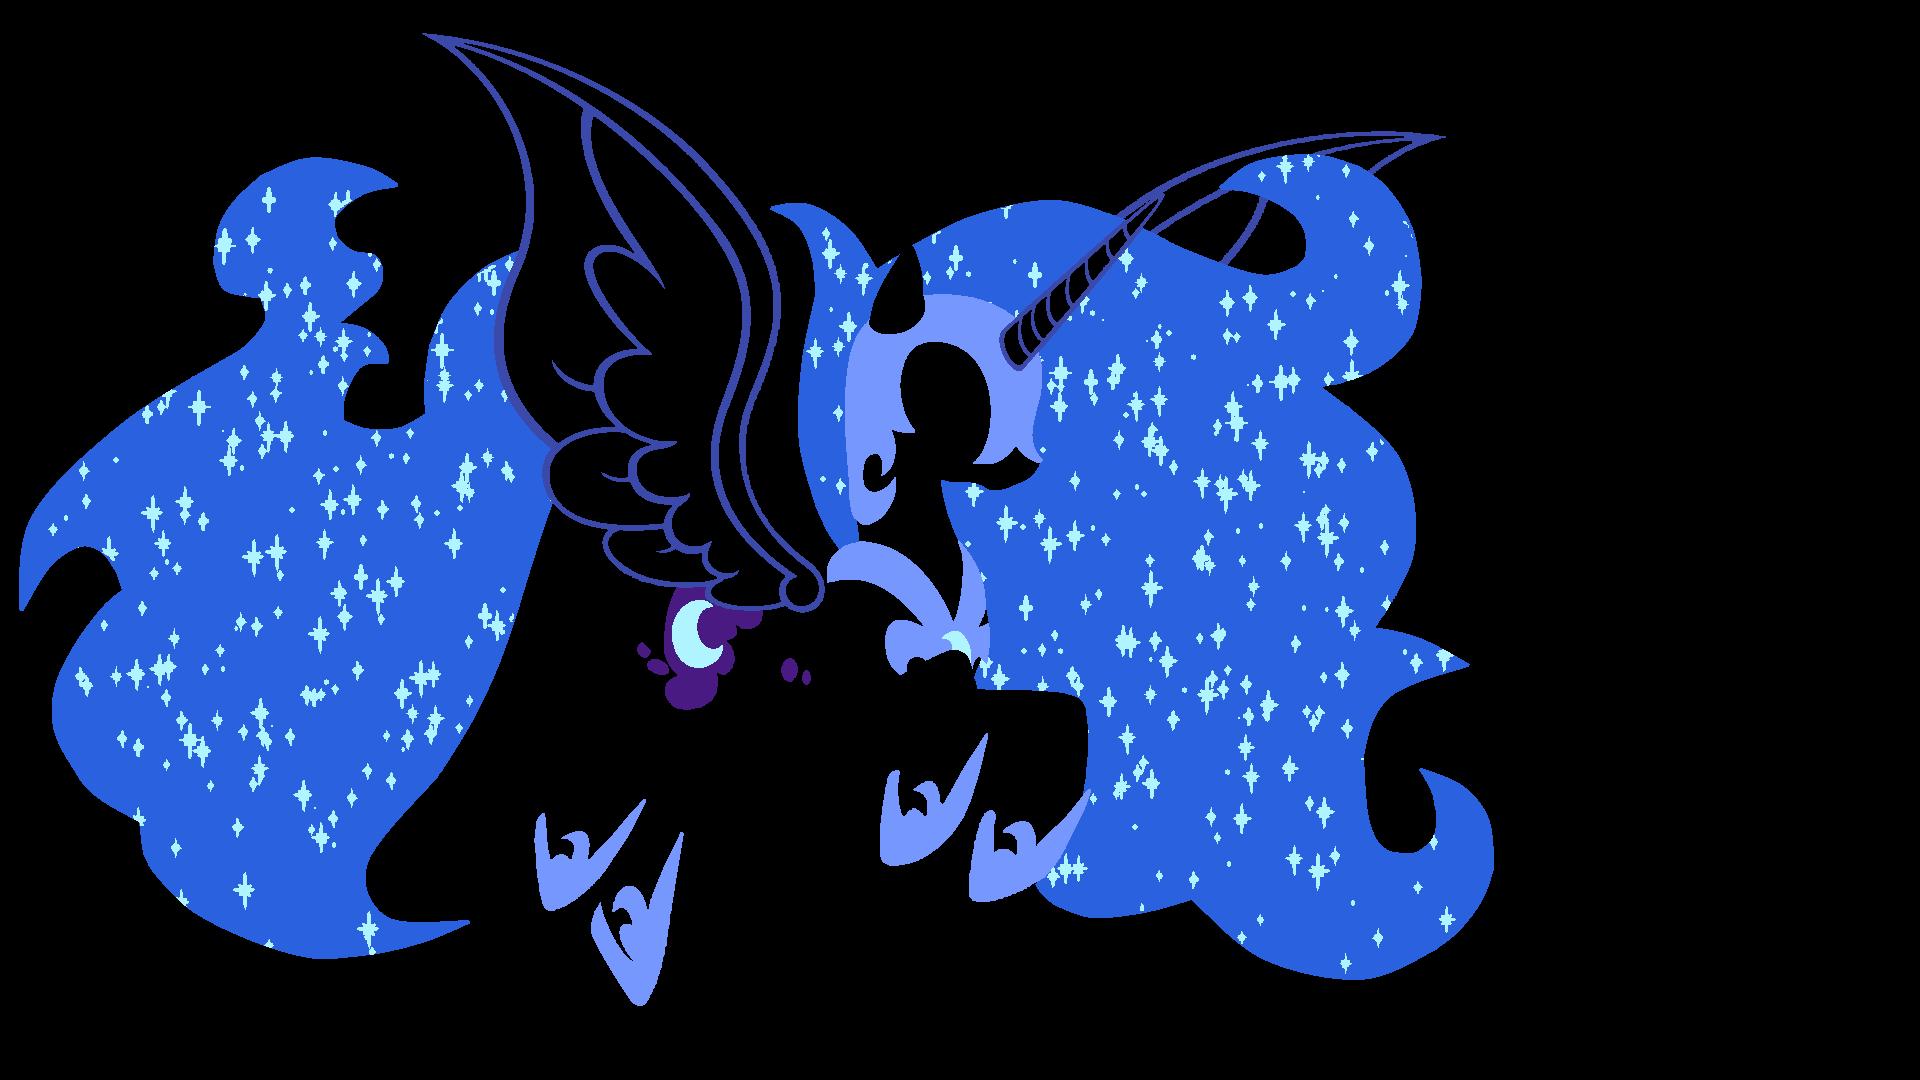 Nightmare Moon Wallpaper by Kitana-Coldfire